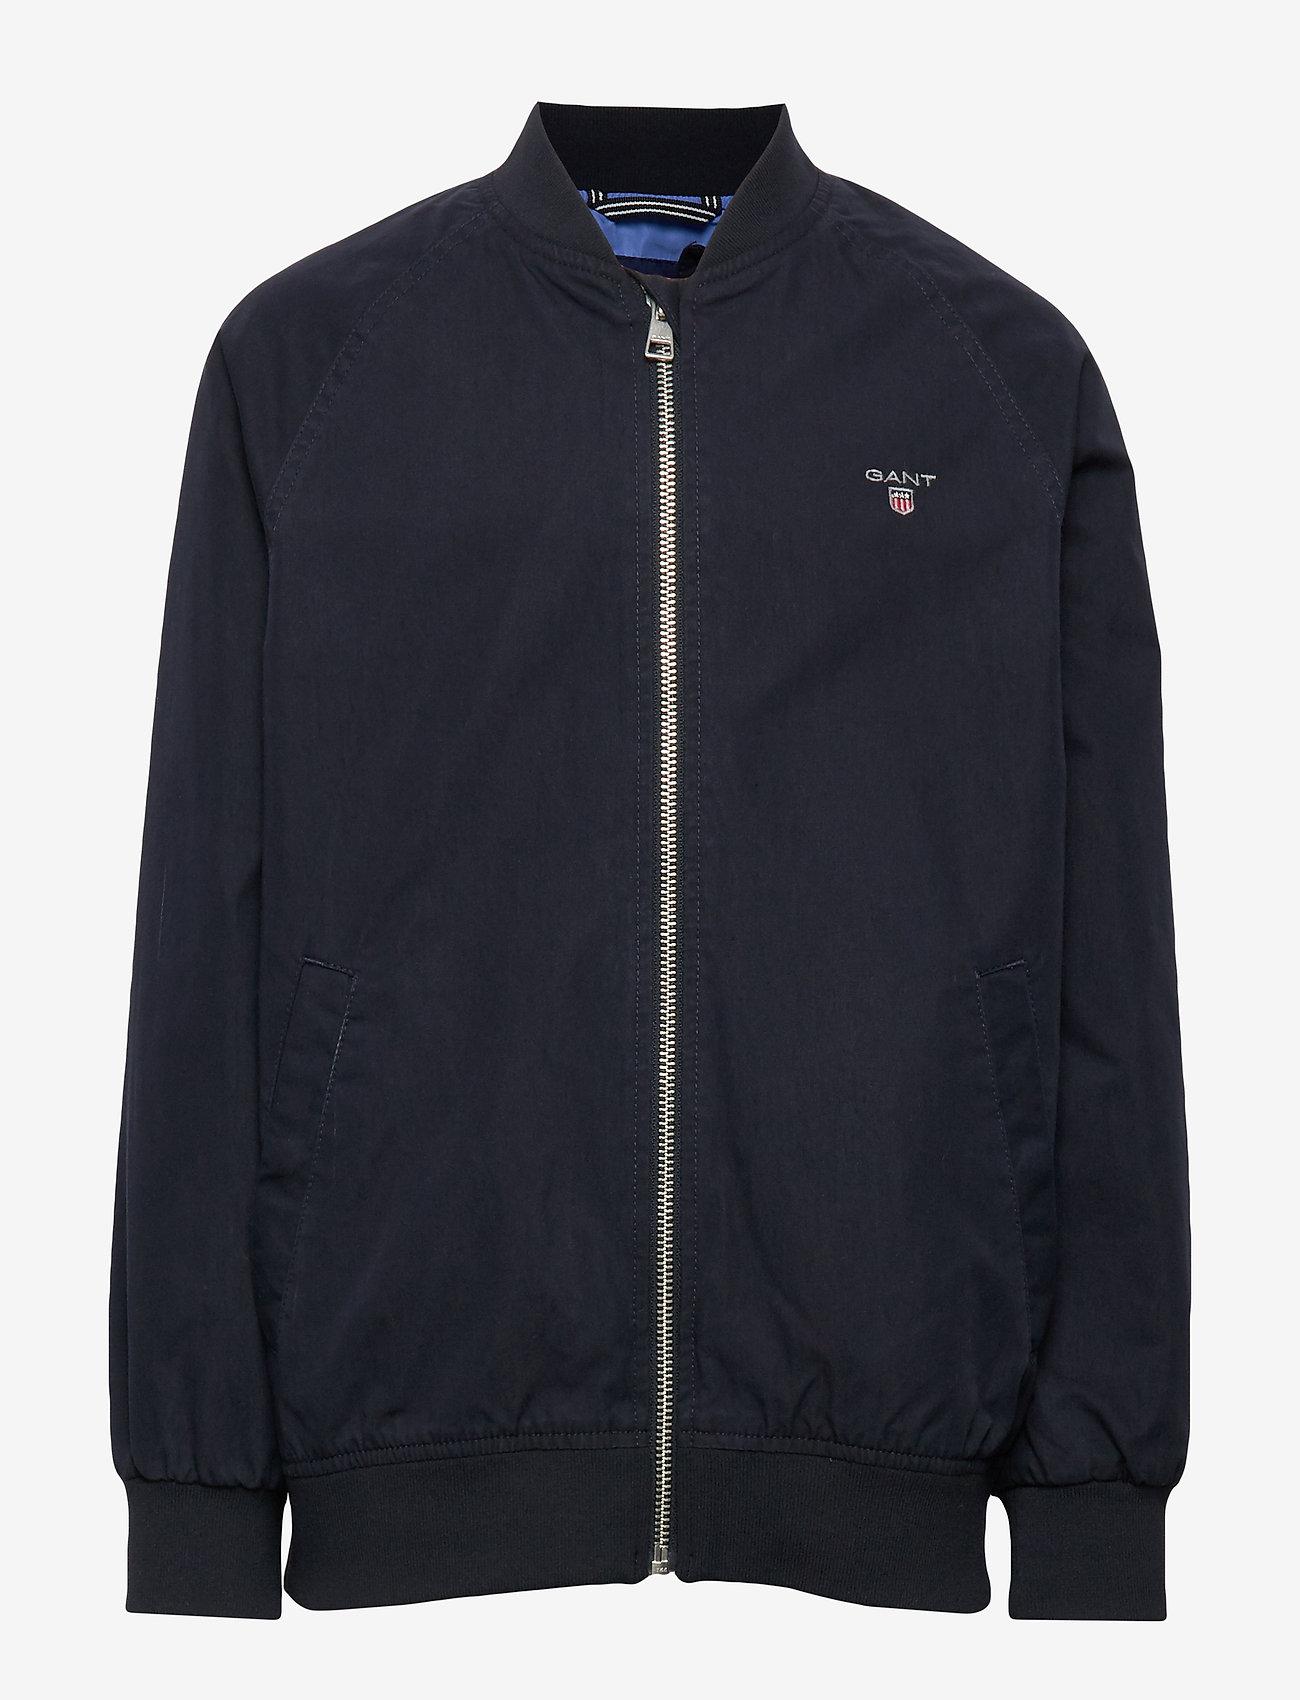 Gant - D1. THE ORIGINAL RIBBED JACKET - bomber jackets - evening blue